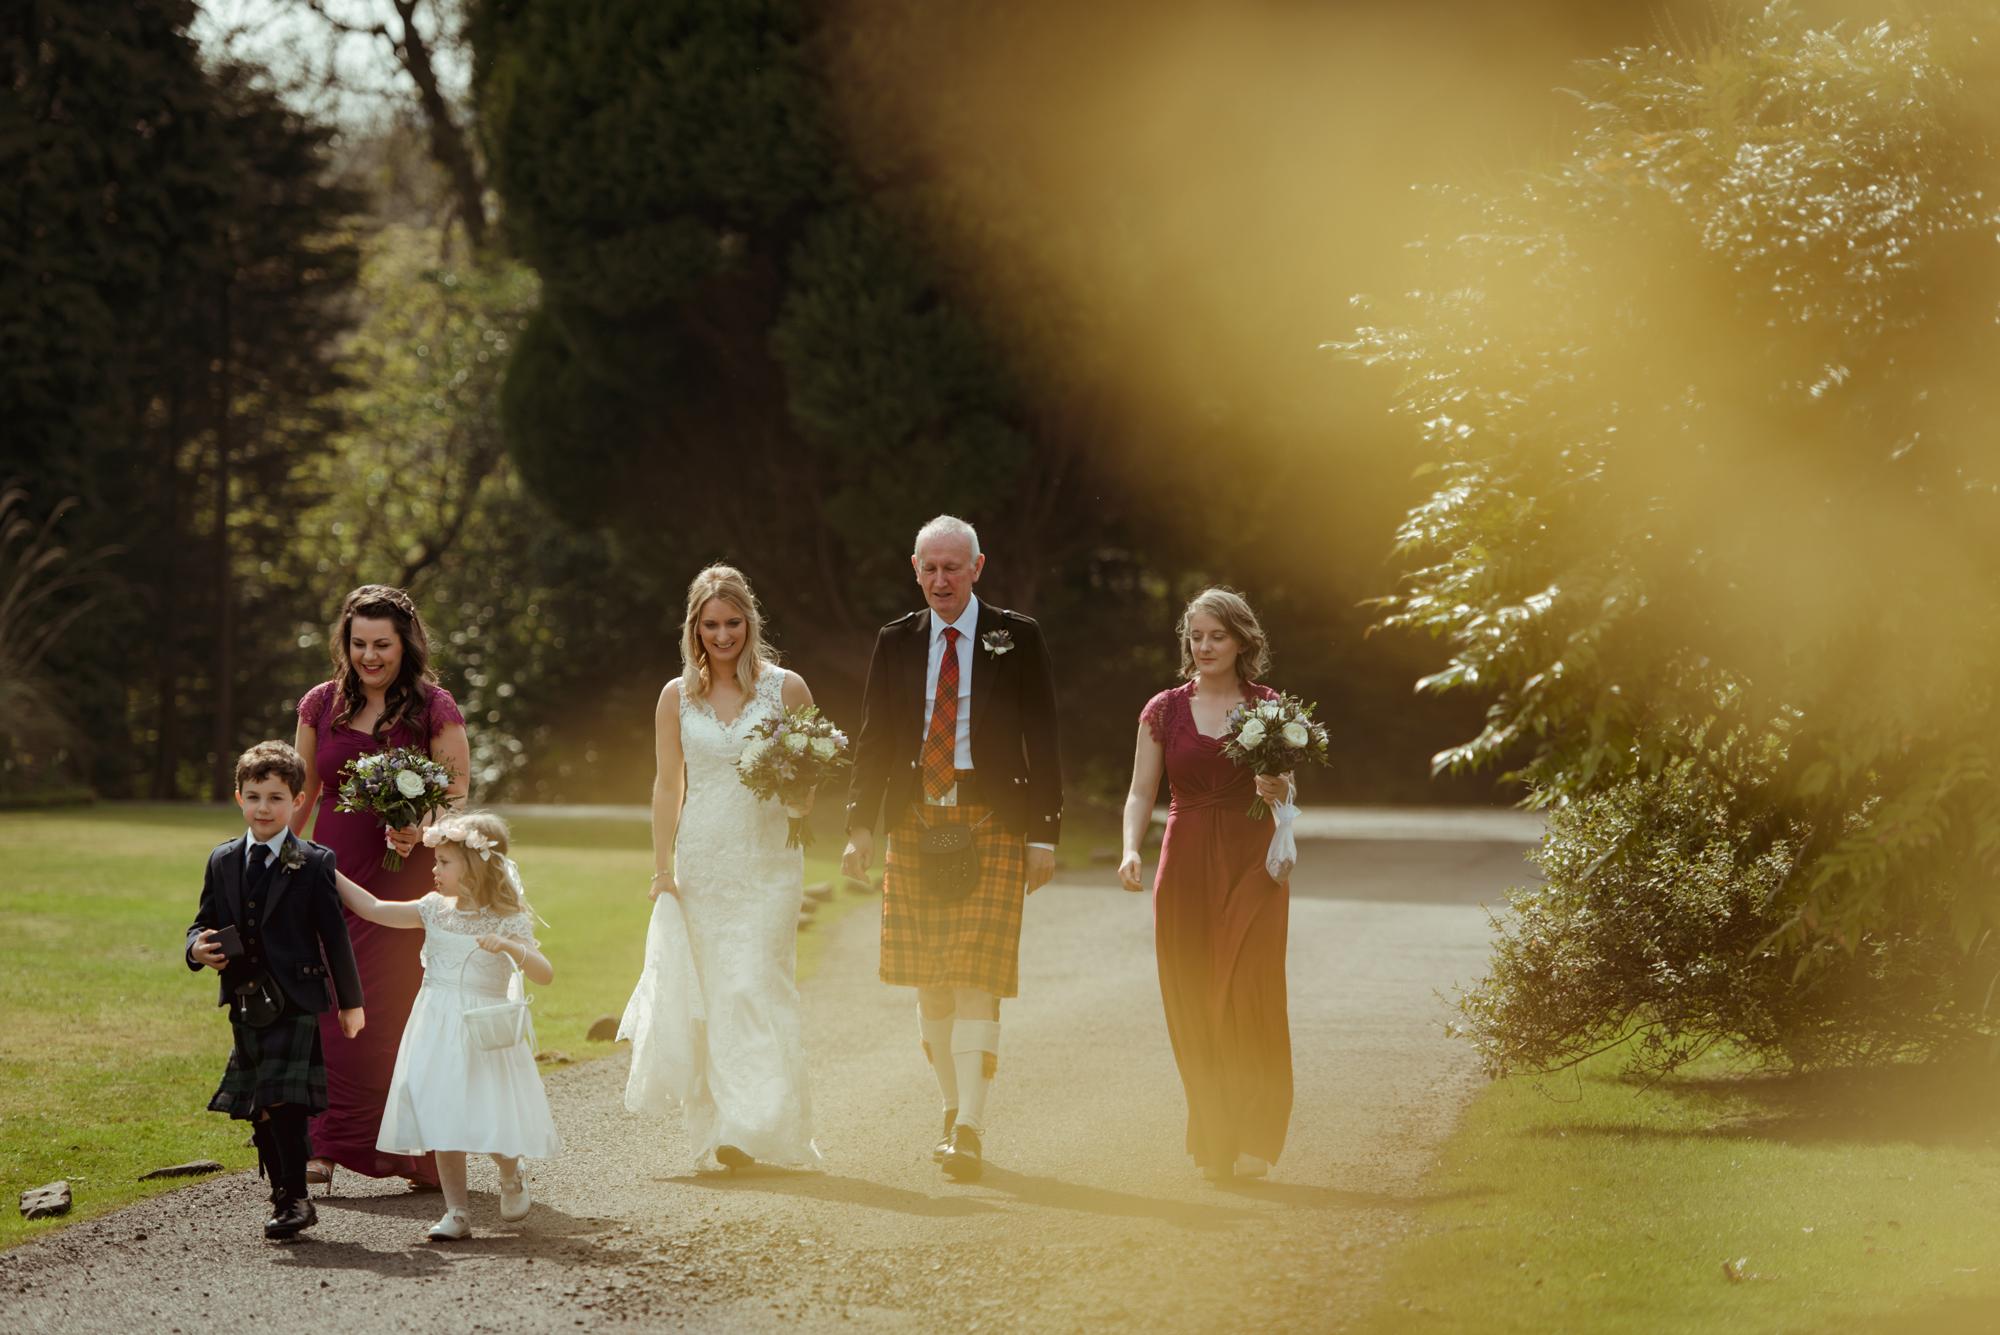 creative-wedding-photography-cruin.jpg